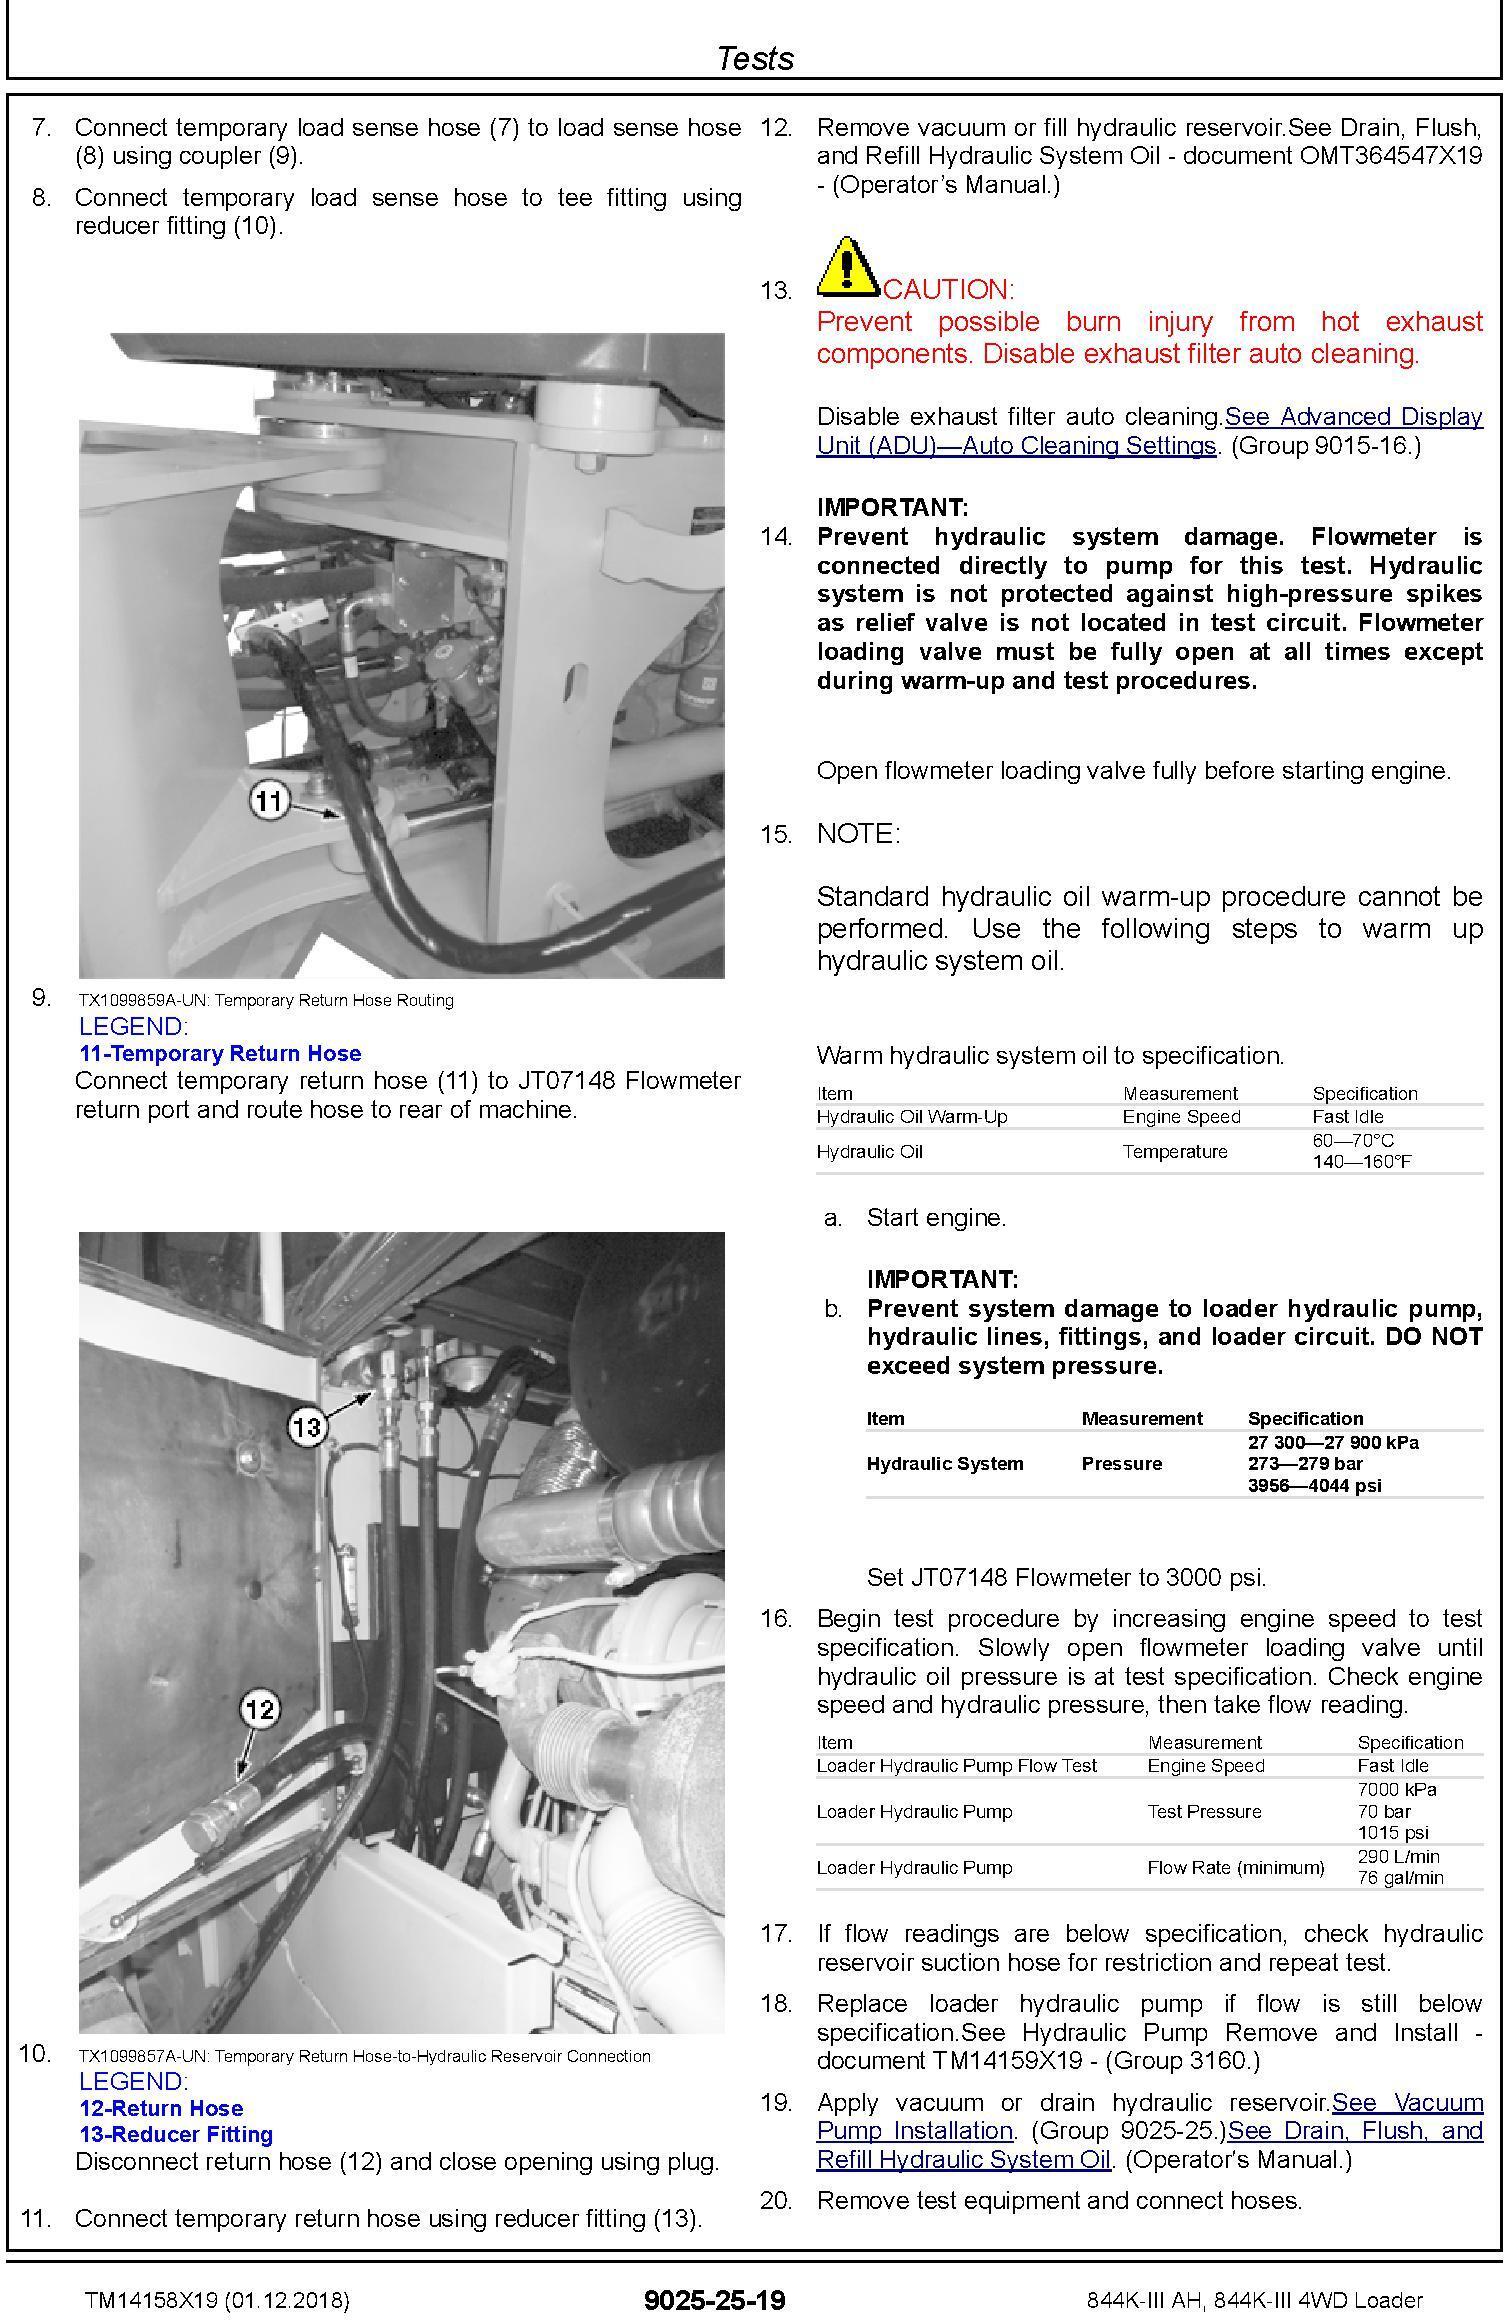 John Deere 844K-III AH, 844K-III (SN. F677782-) 4WD Loader Diagnostic Technical Manual (TM14158X19) - 3